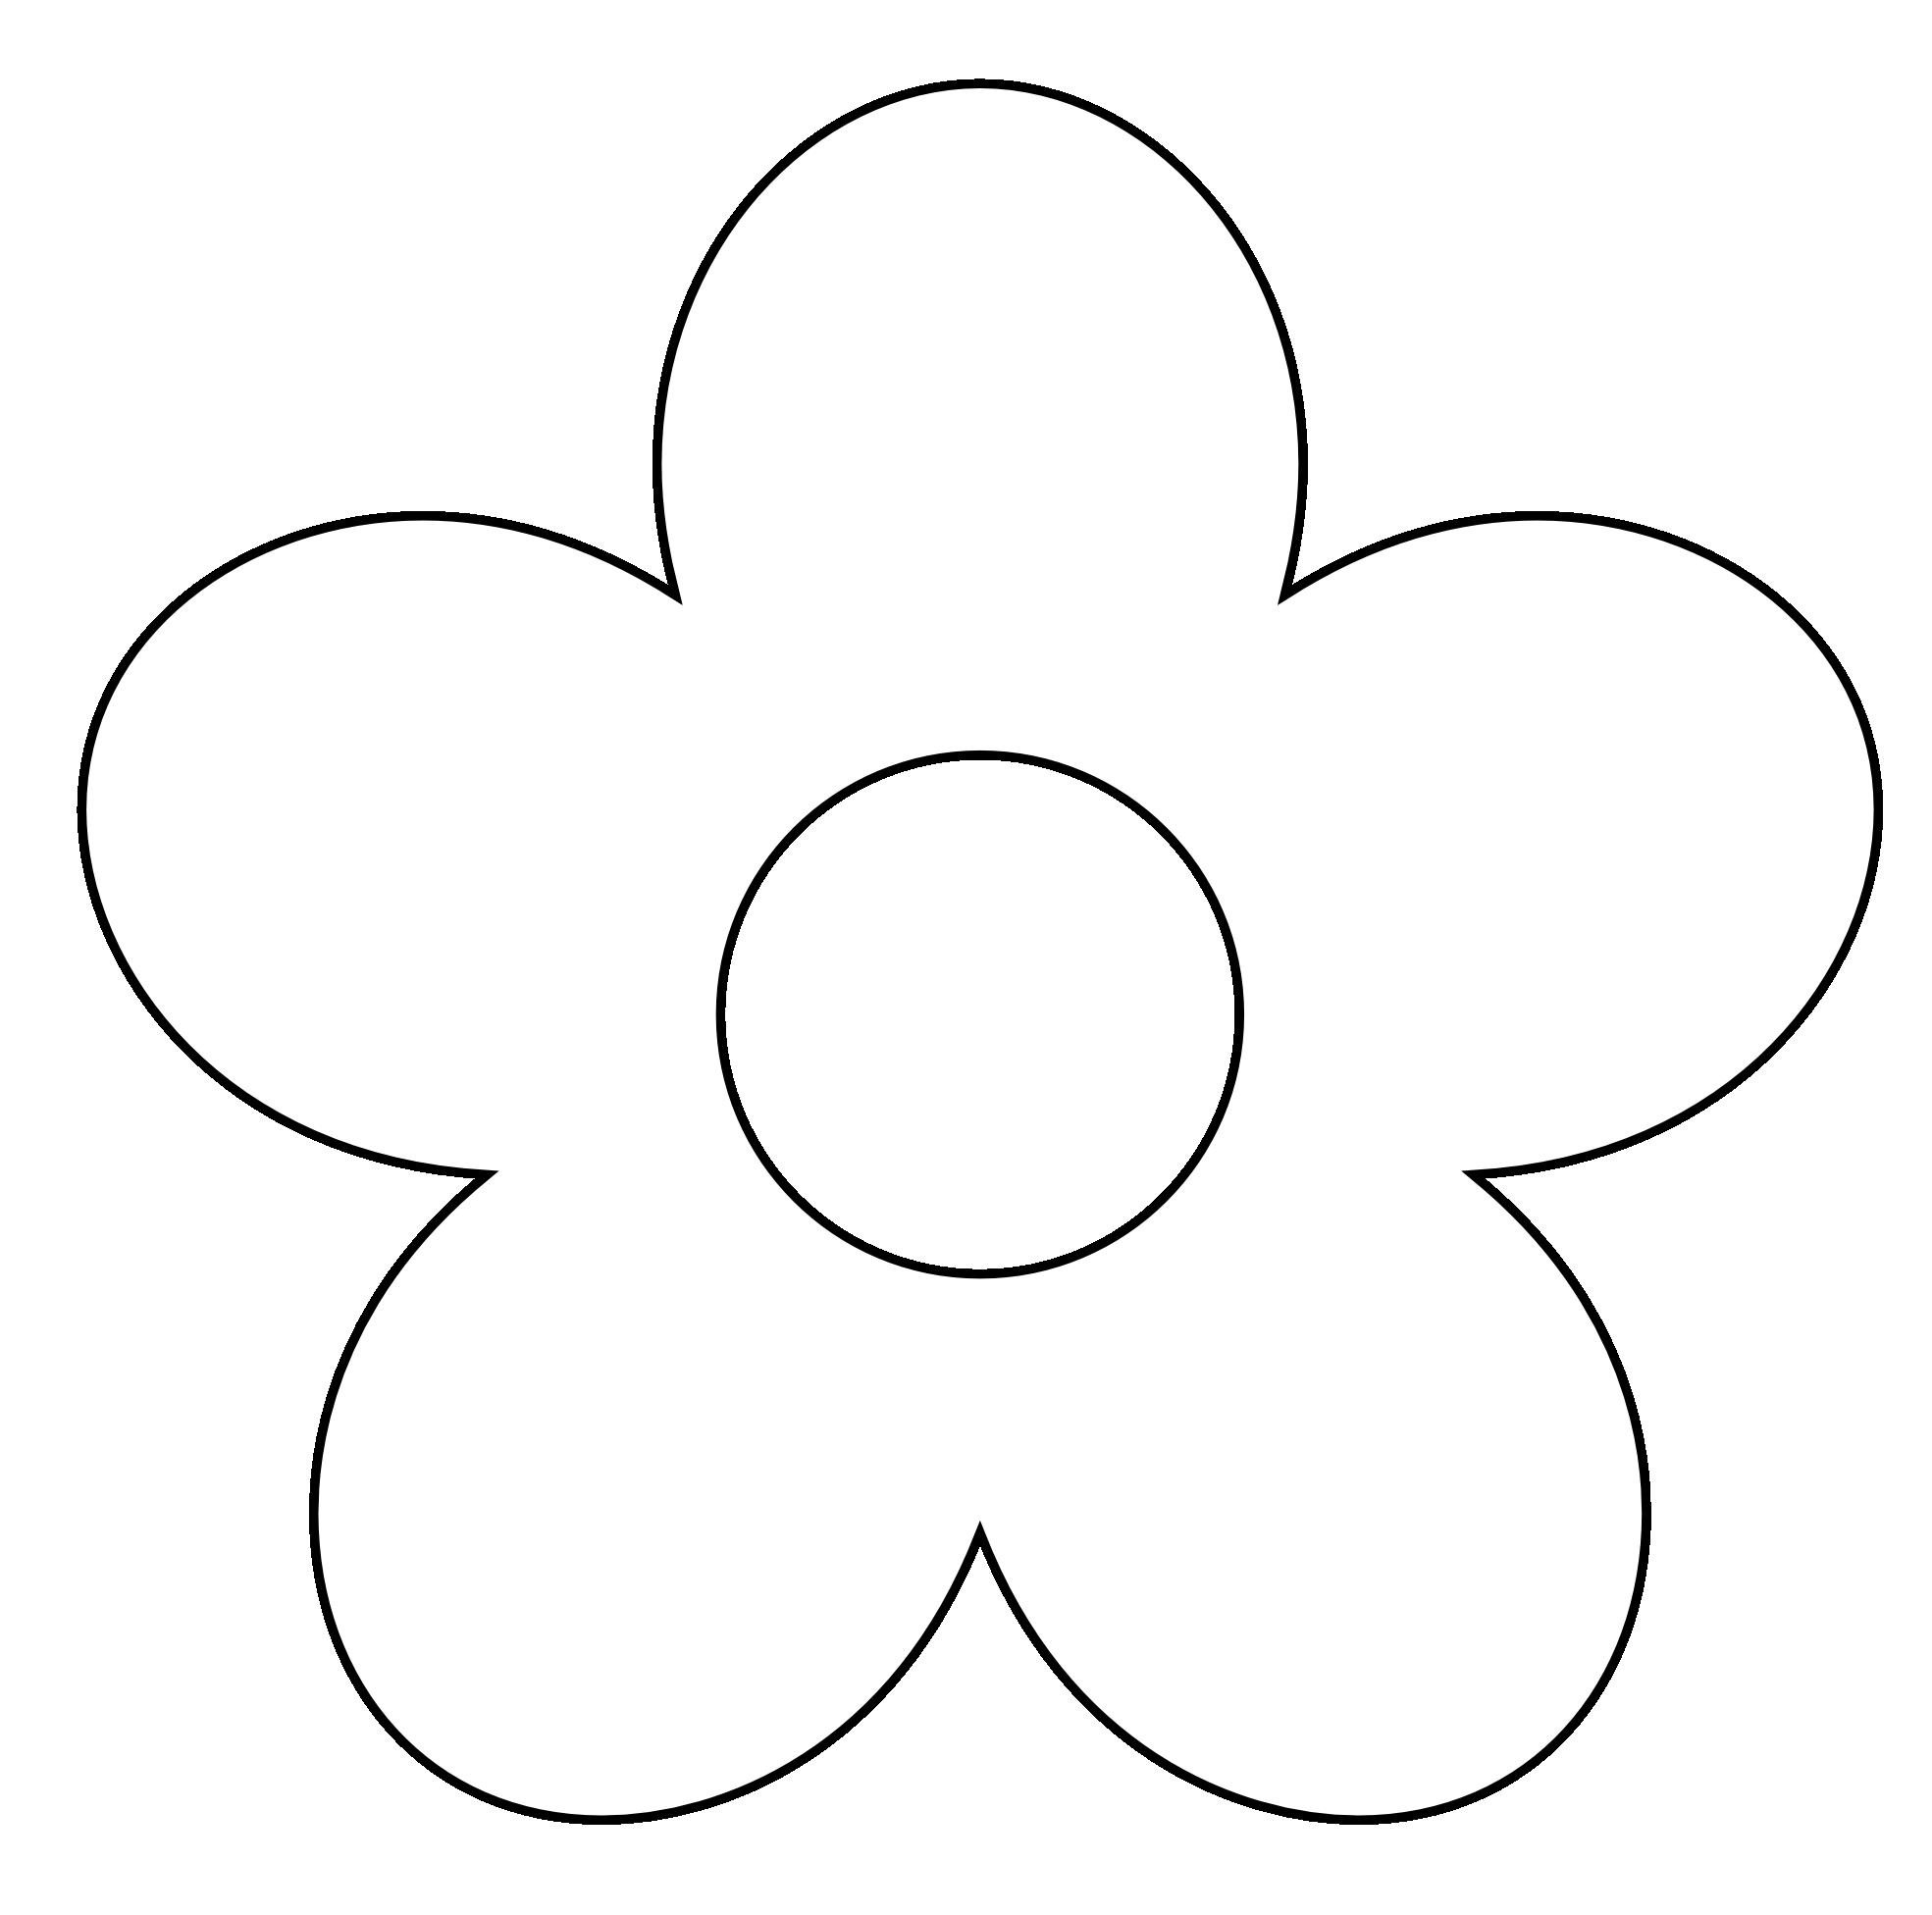 Flower Clipart Black And Whit - White Flower Clipart